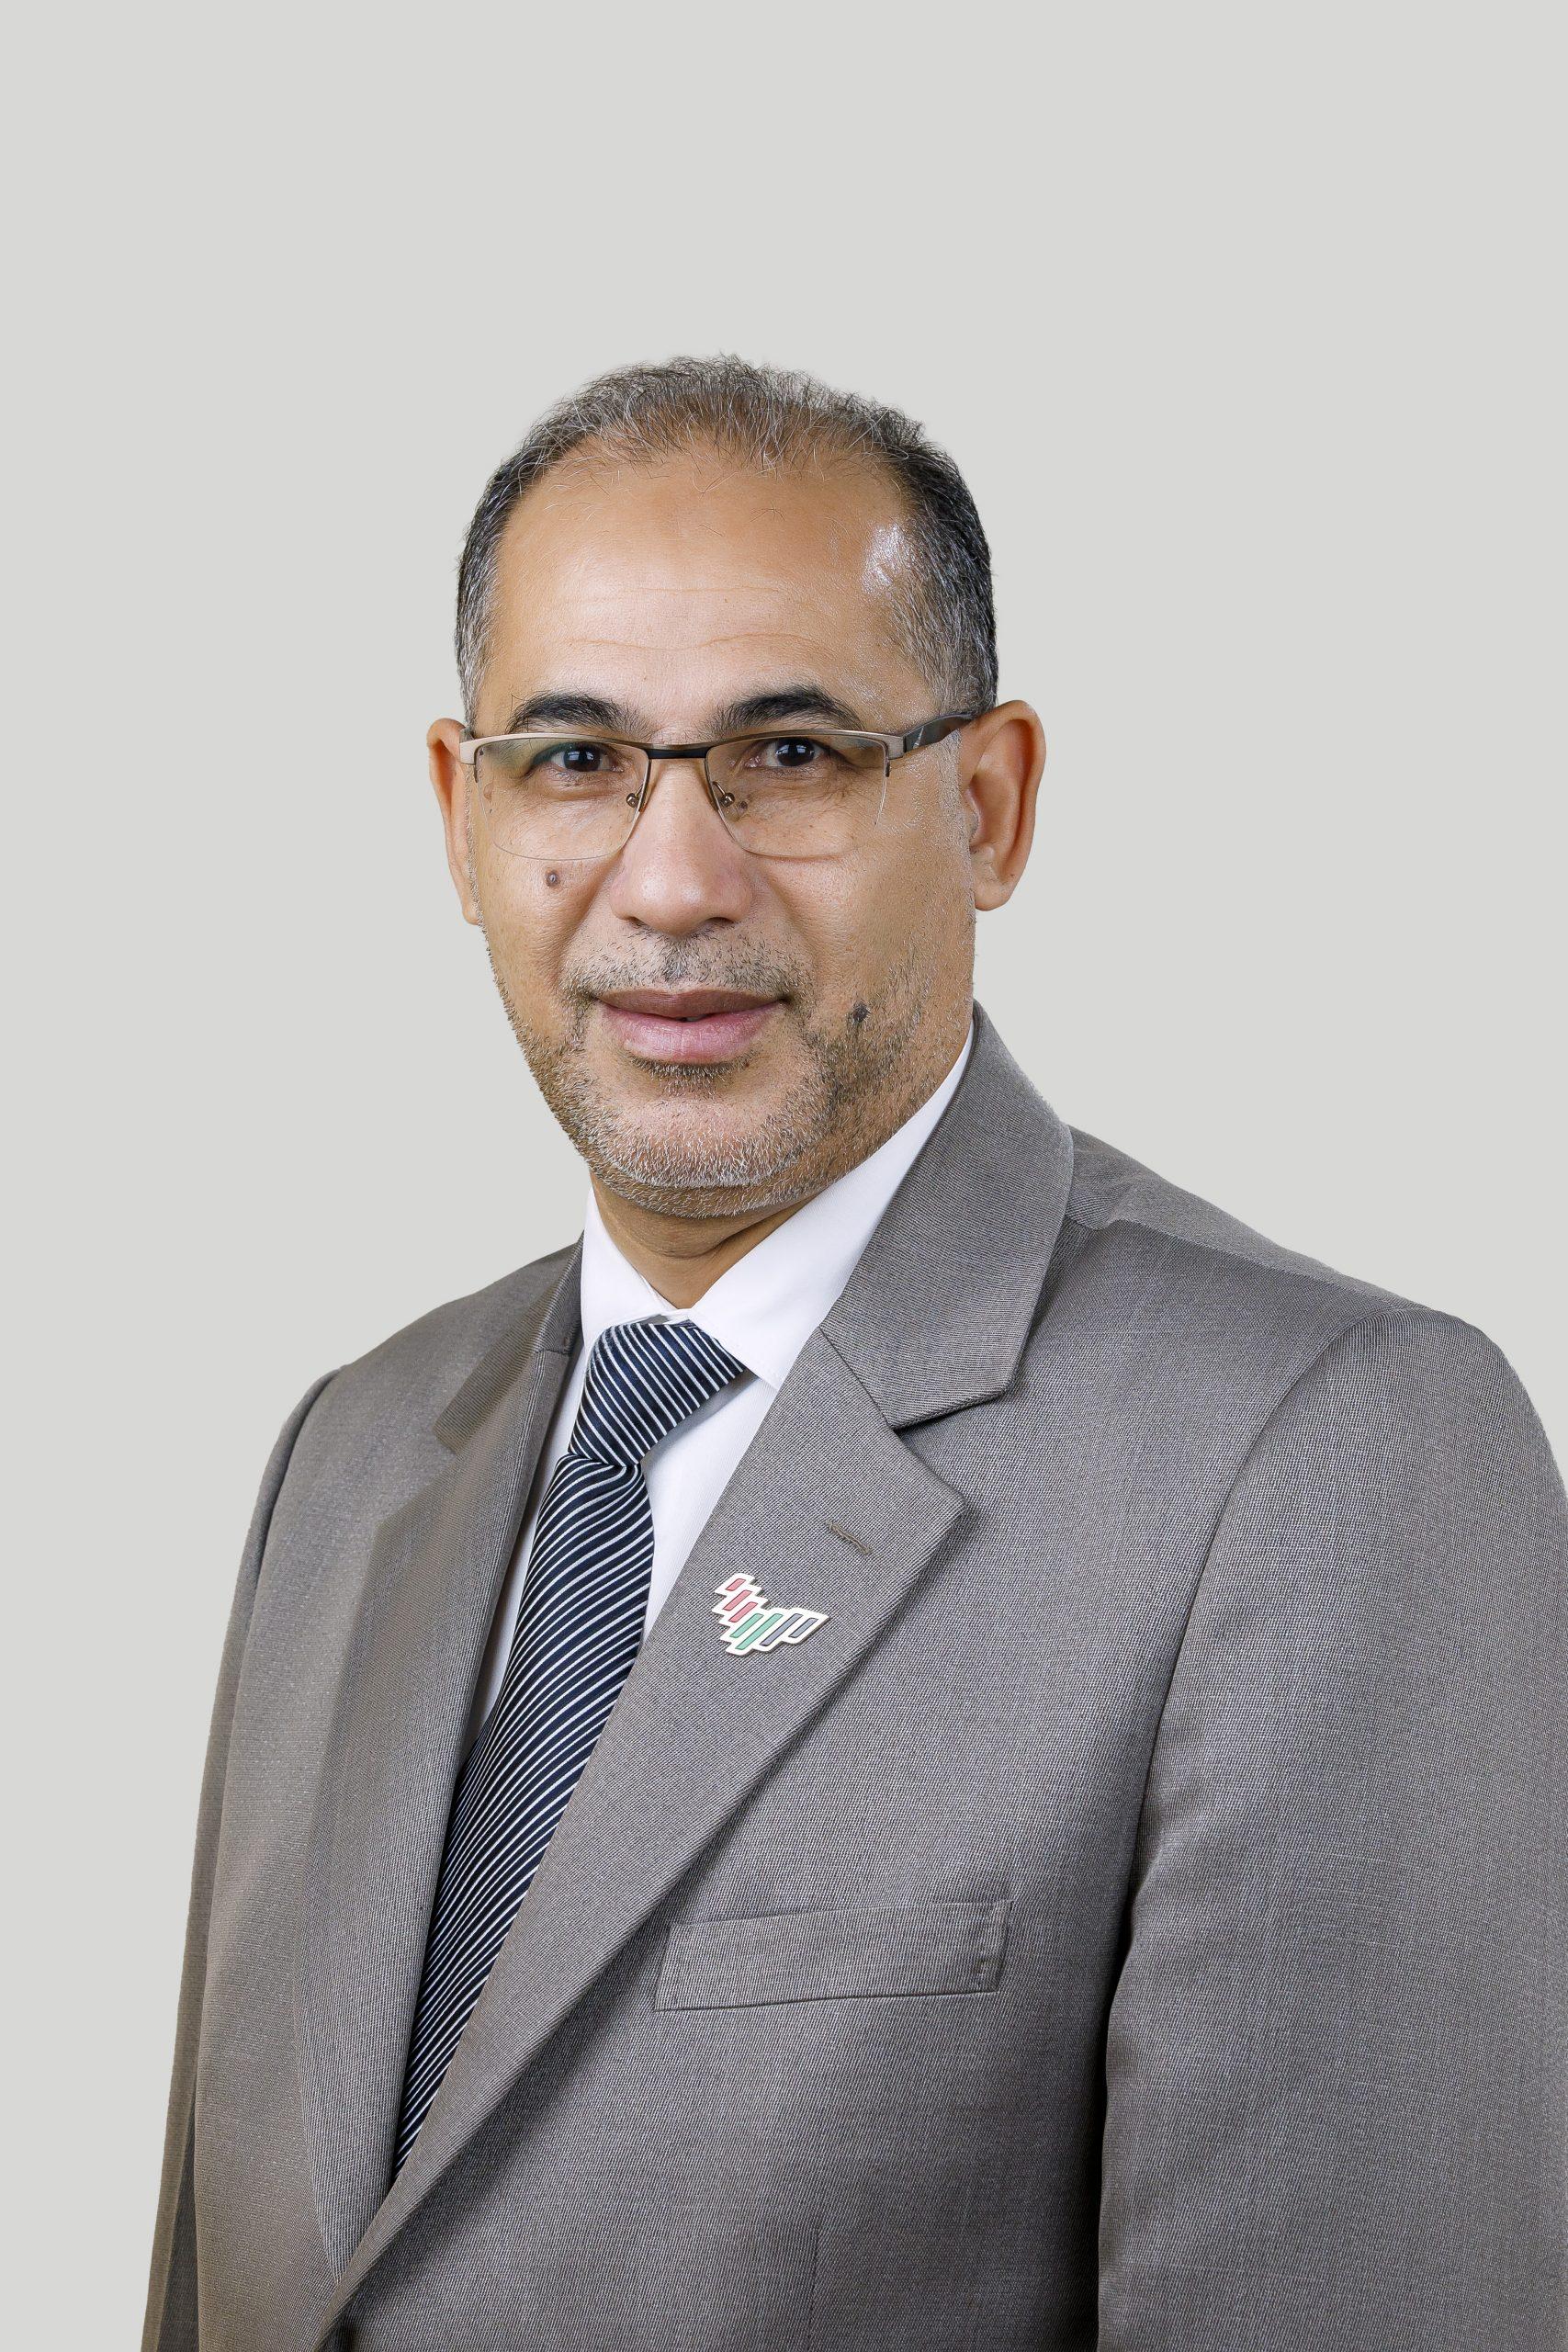 Dr. Bensalem Sahel